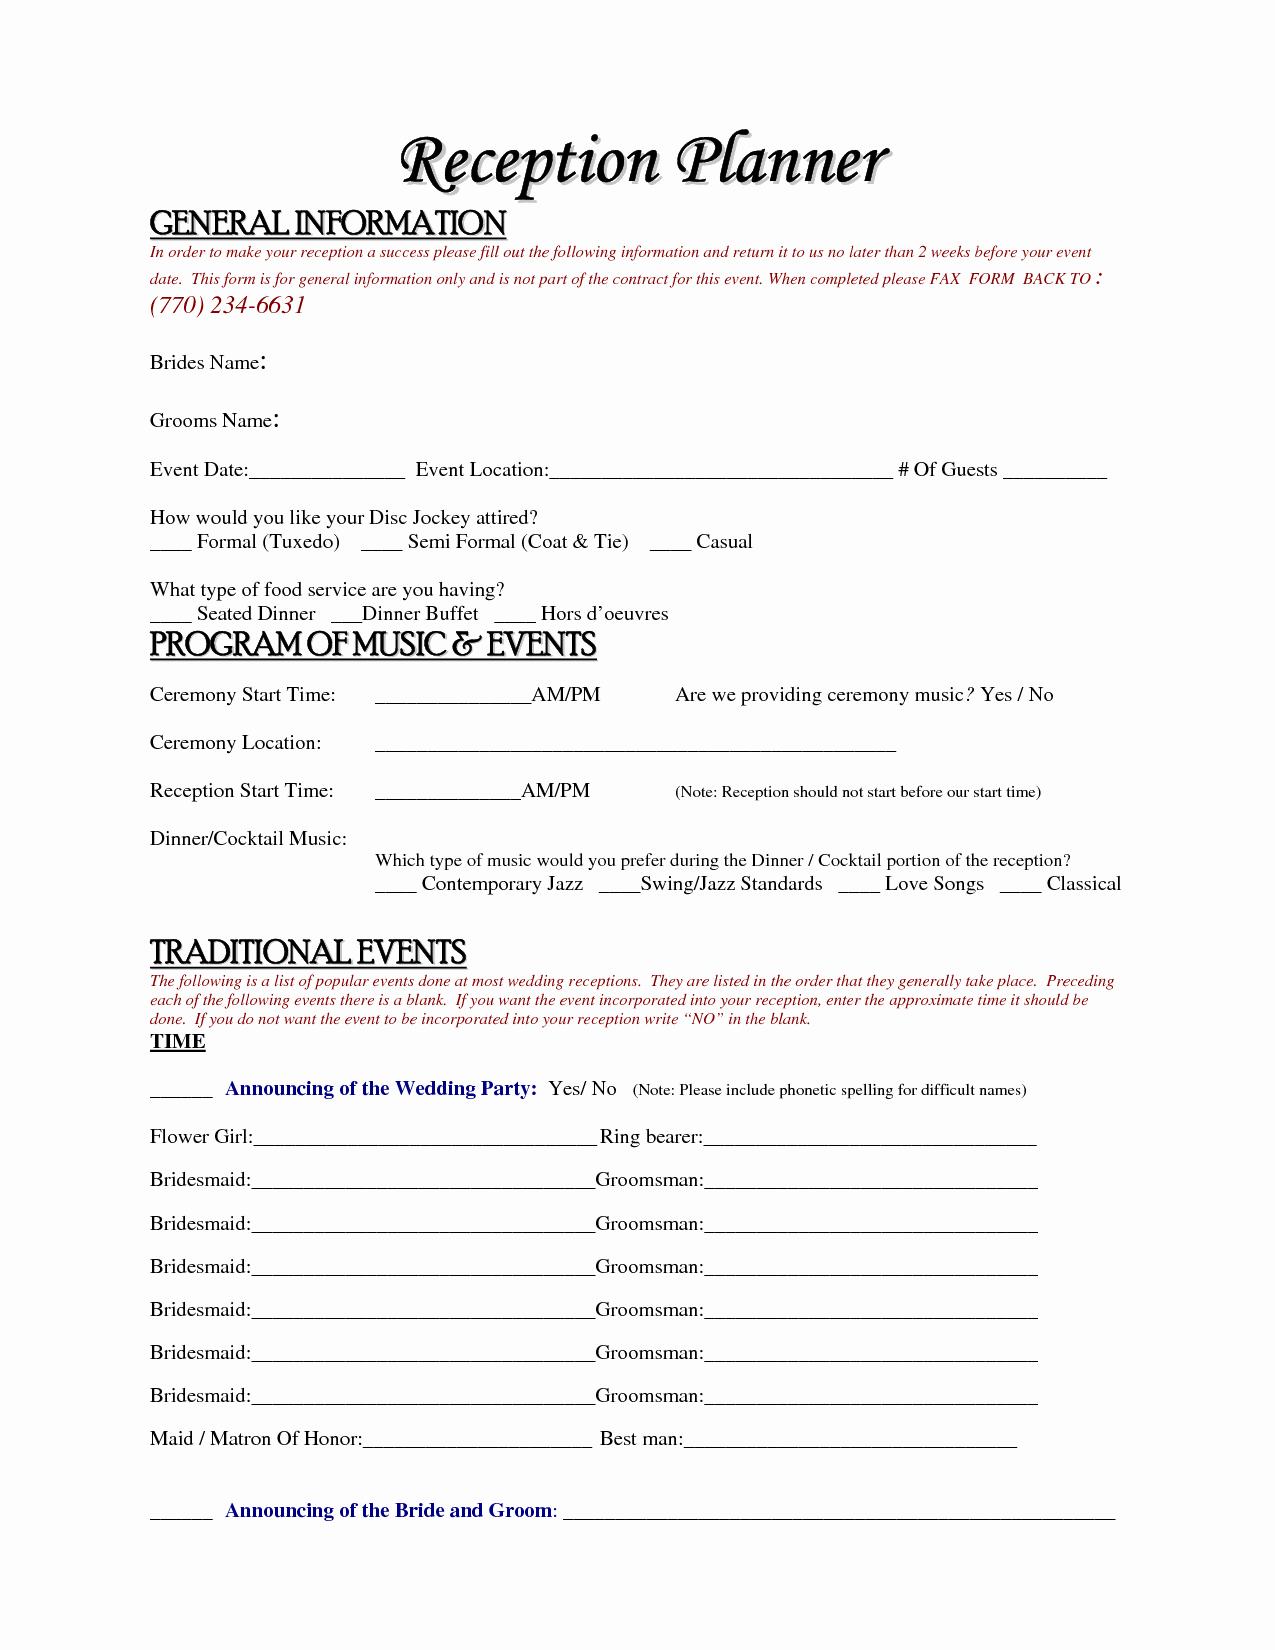 Wedding Dj Contract Template Elegant Free Wedding Planner Contract Template Accessoires Pour Réussir Votre Mariage Sur